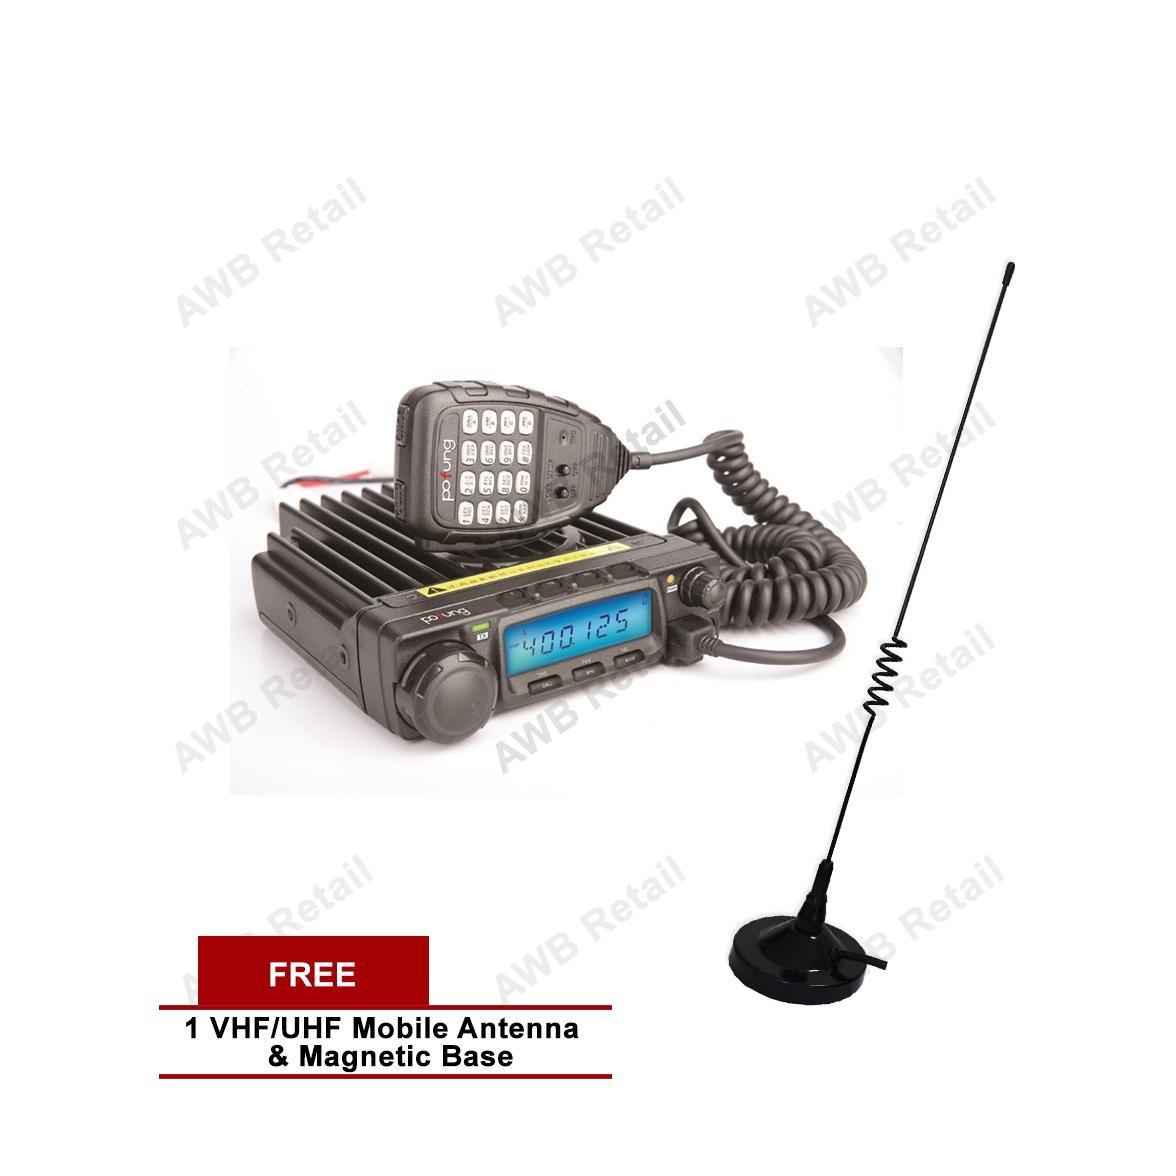 Baofeng BF-9500 UHF Mobile Transceiver Vehicle Radio (Black) with FREE UHF/VHF Mobile Antenna & Magnetic Base